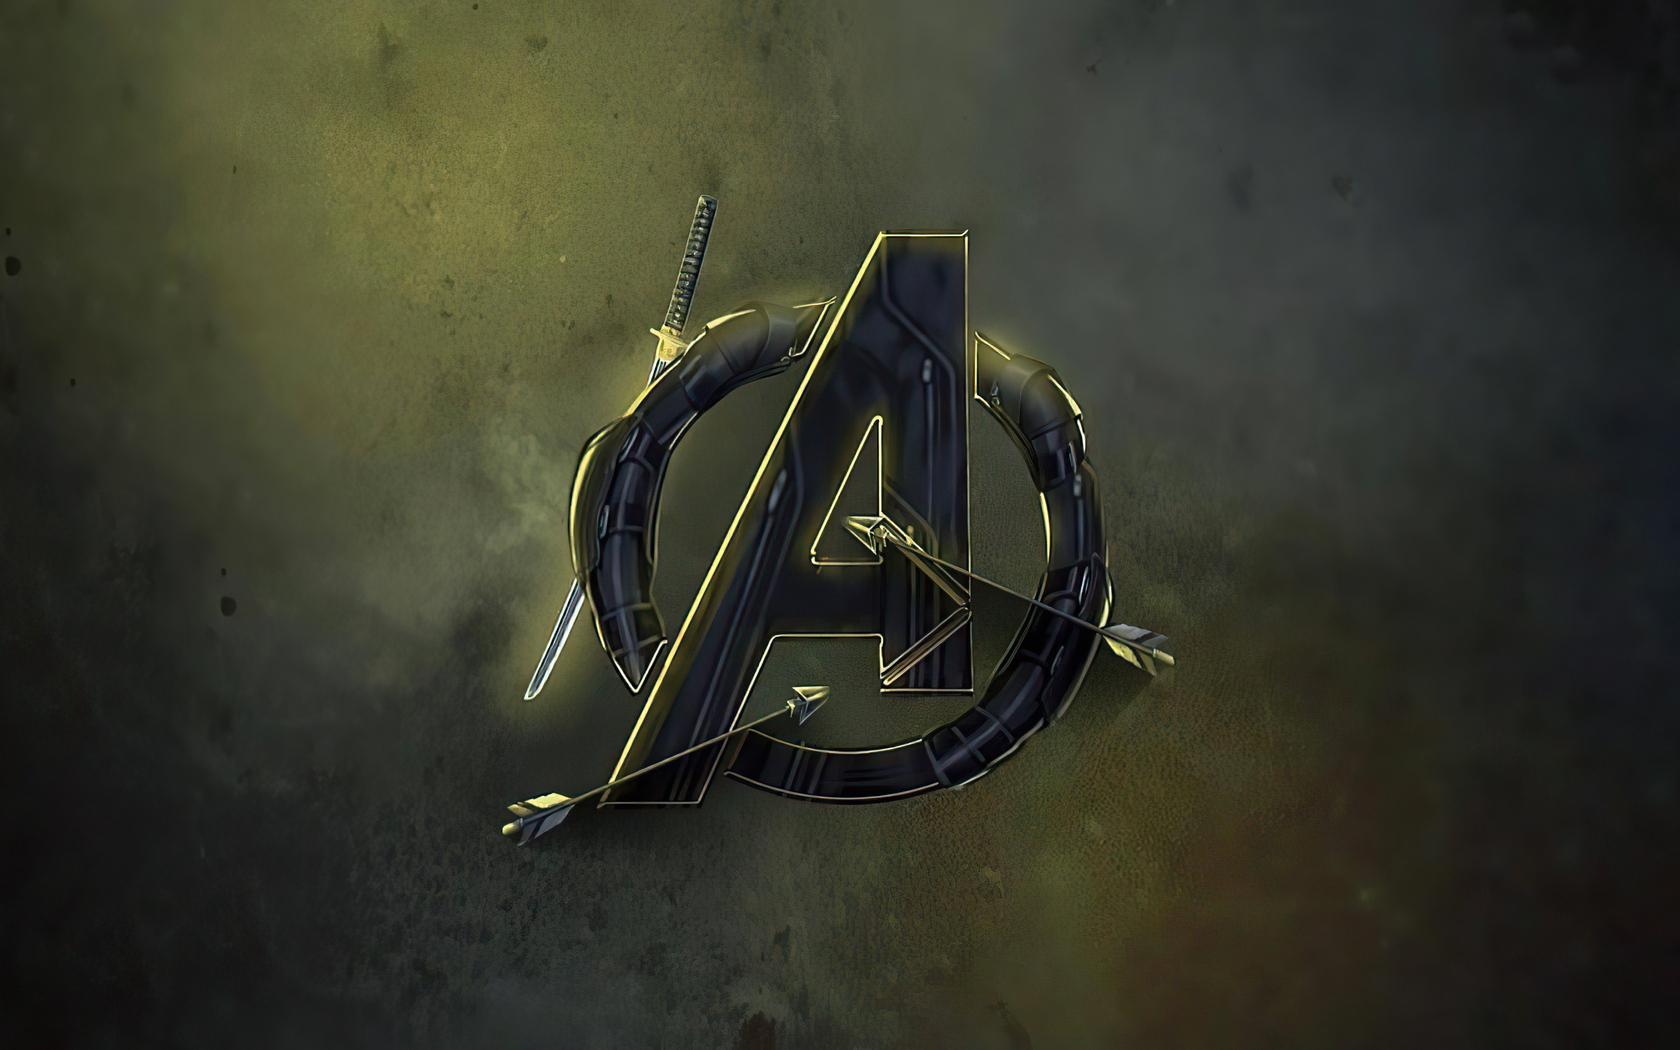 avengers-end-game-mcu-logo-4k-bj.jpg